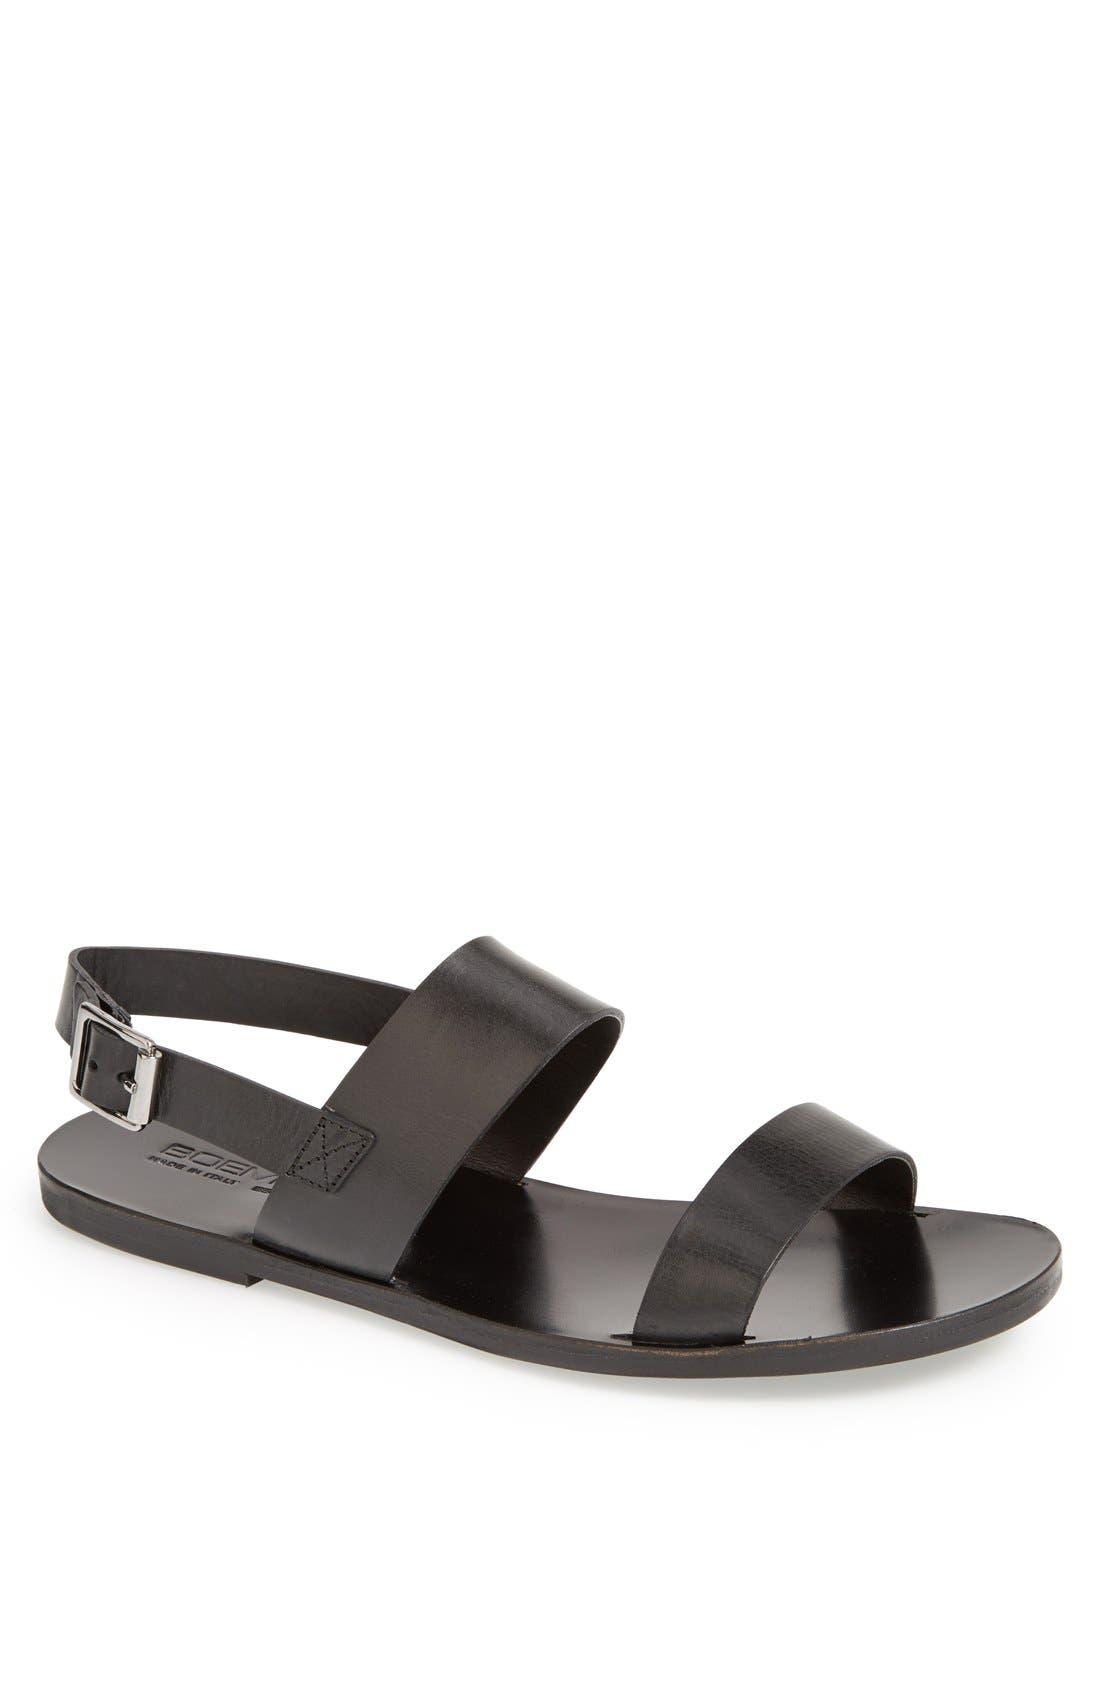 Main Image - Boemos Leather Sandal (Men)